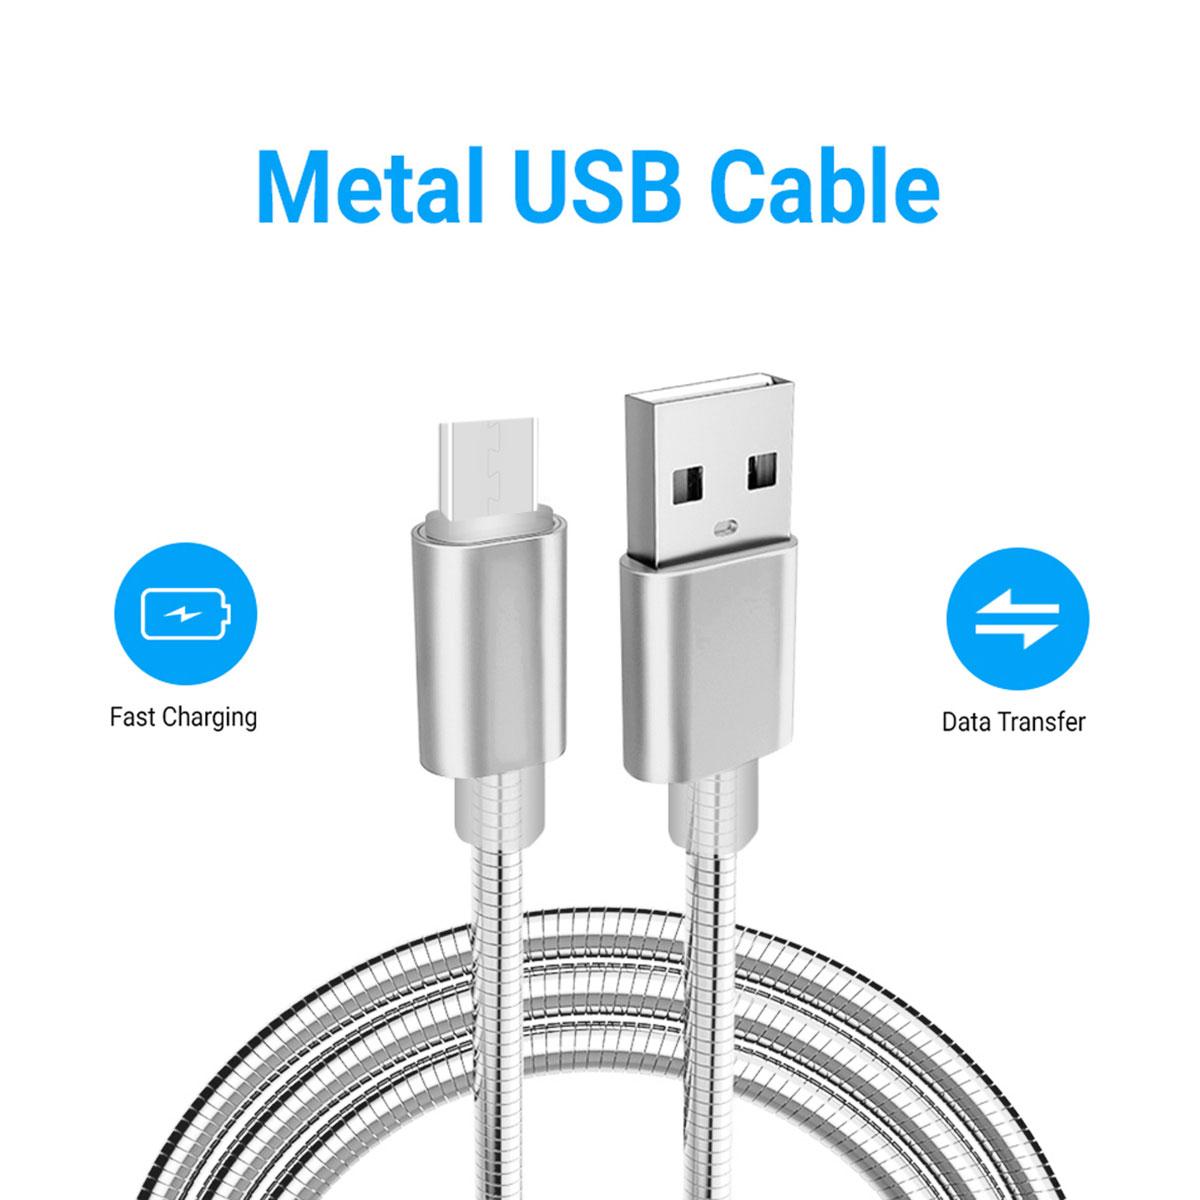 MCRO-USB-MTL-CBLE-SLV-2